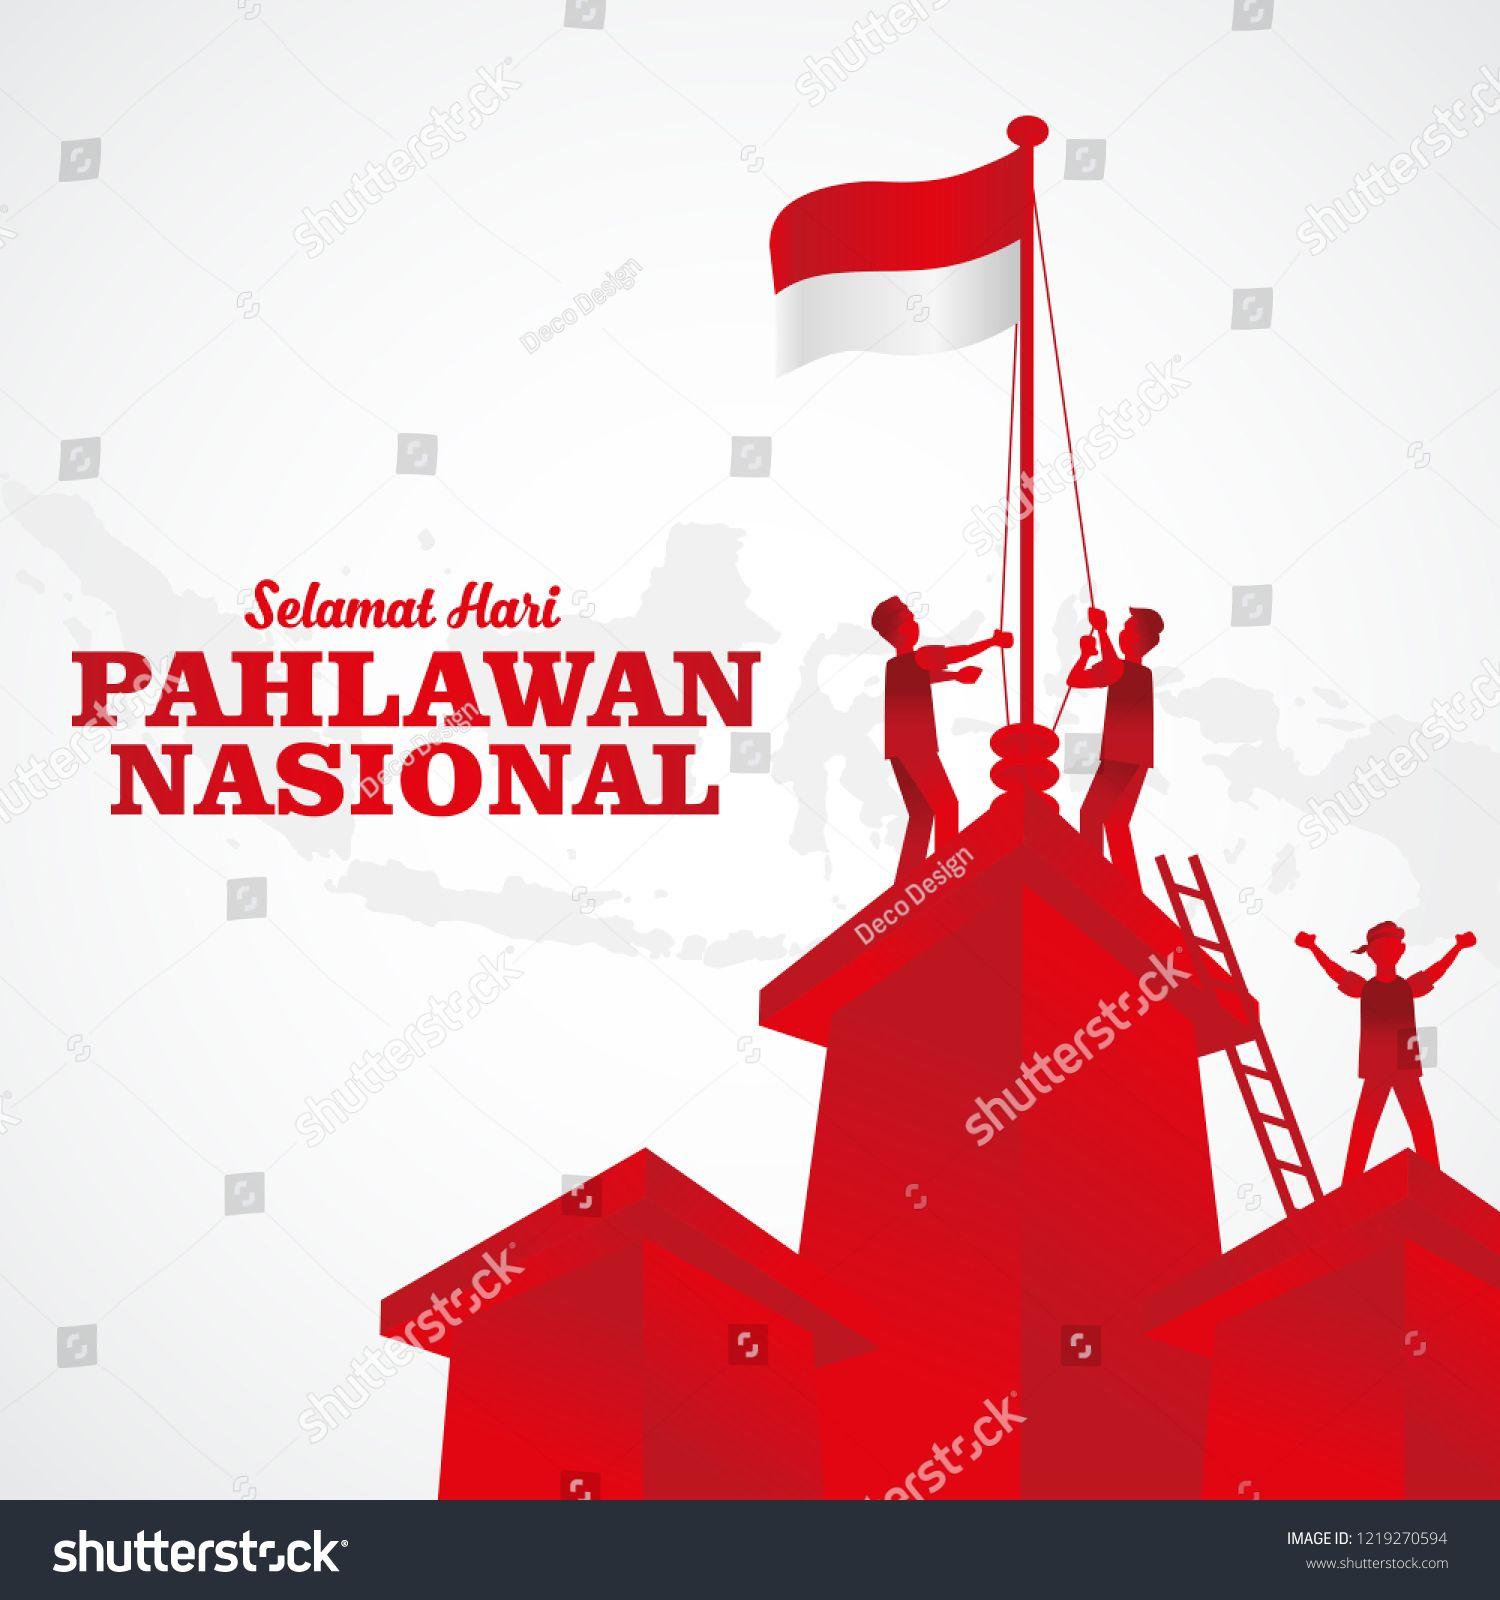 Vector Illustration. Selamat Hari Pahlawan Nasional. Translation